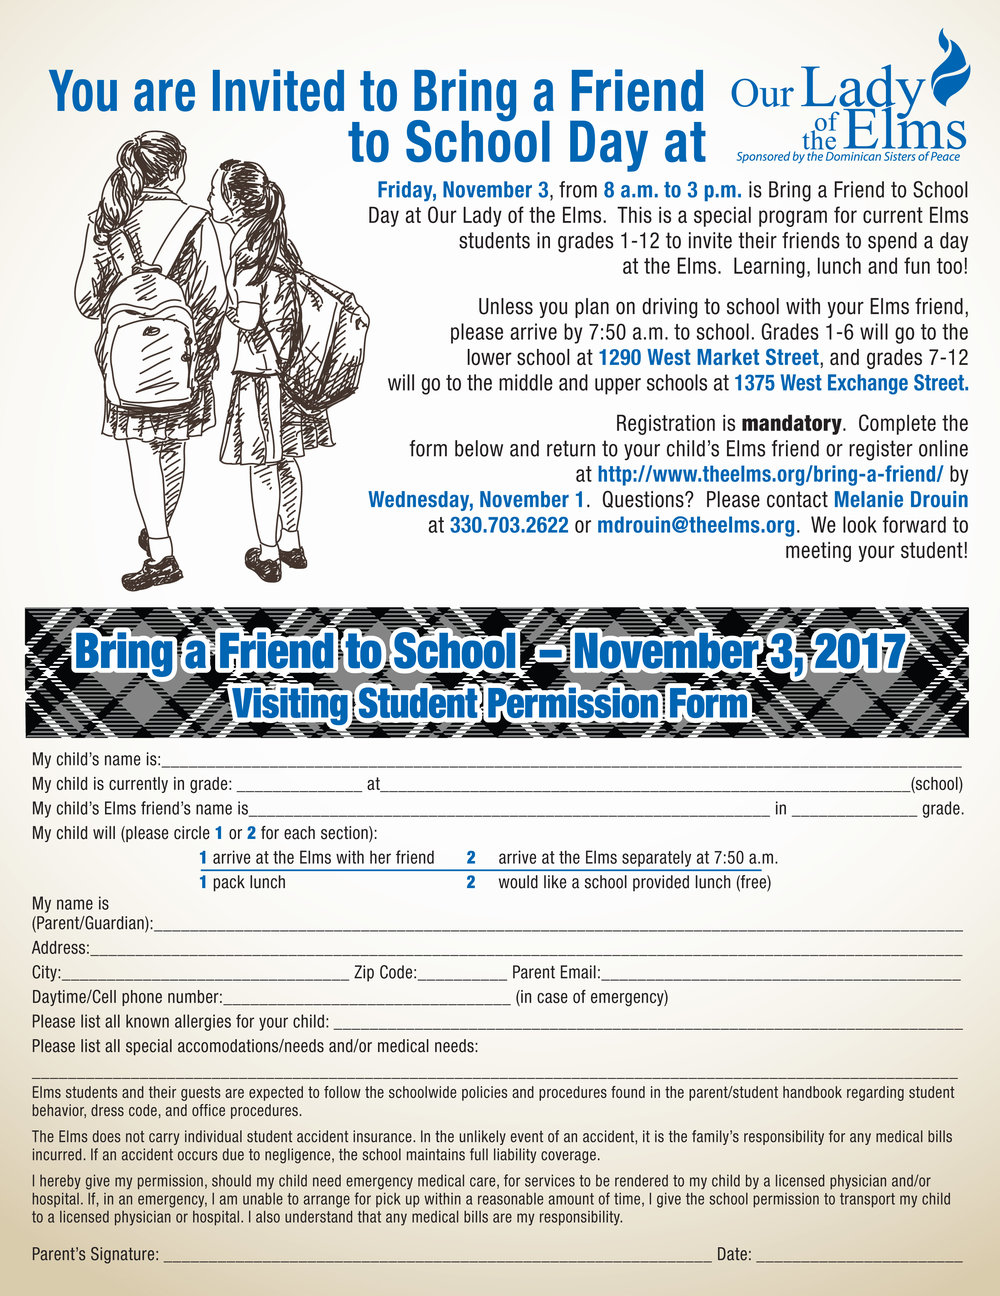 Bring Friend 2 School Flyer.jpg